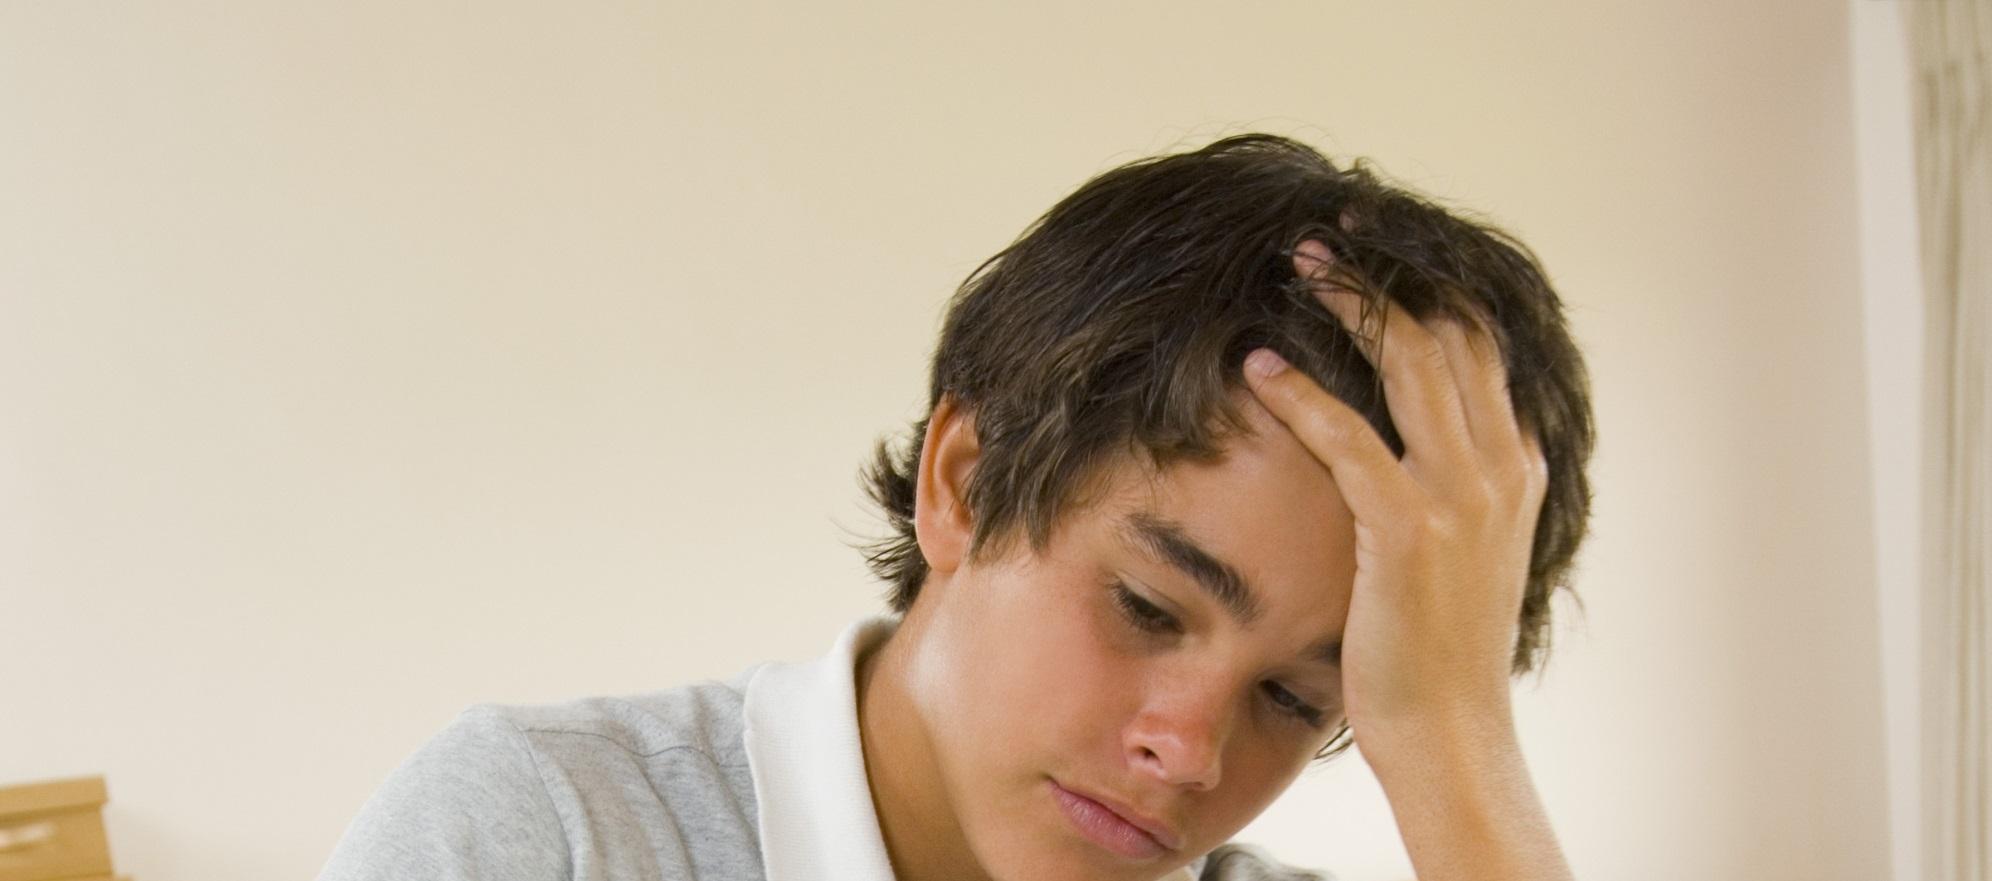 Teen doing homework, looking stressed